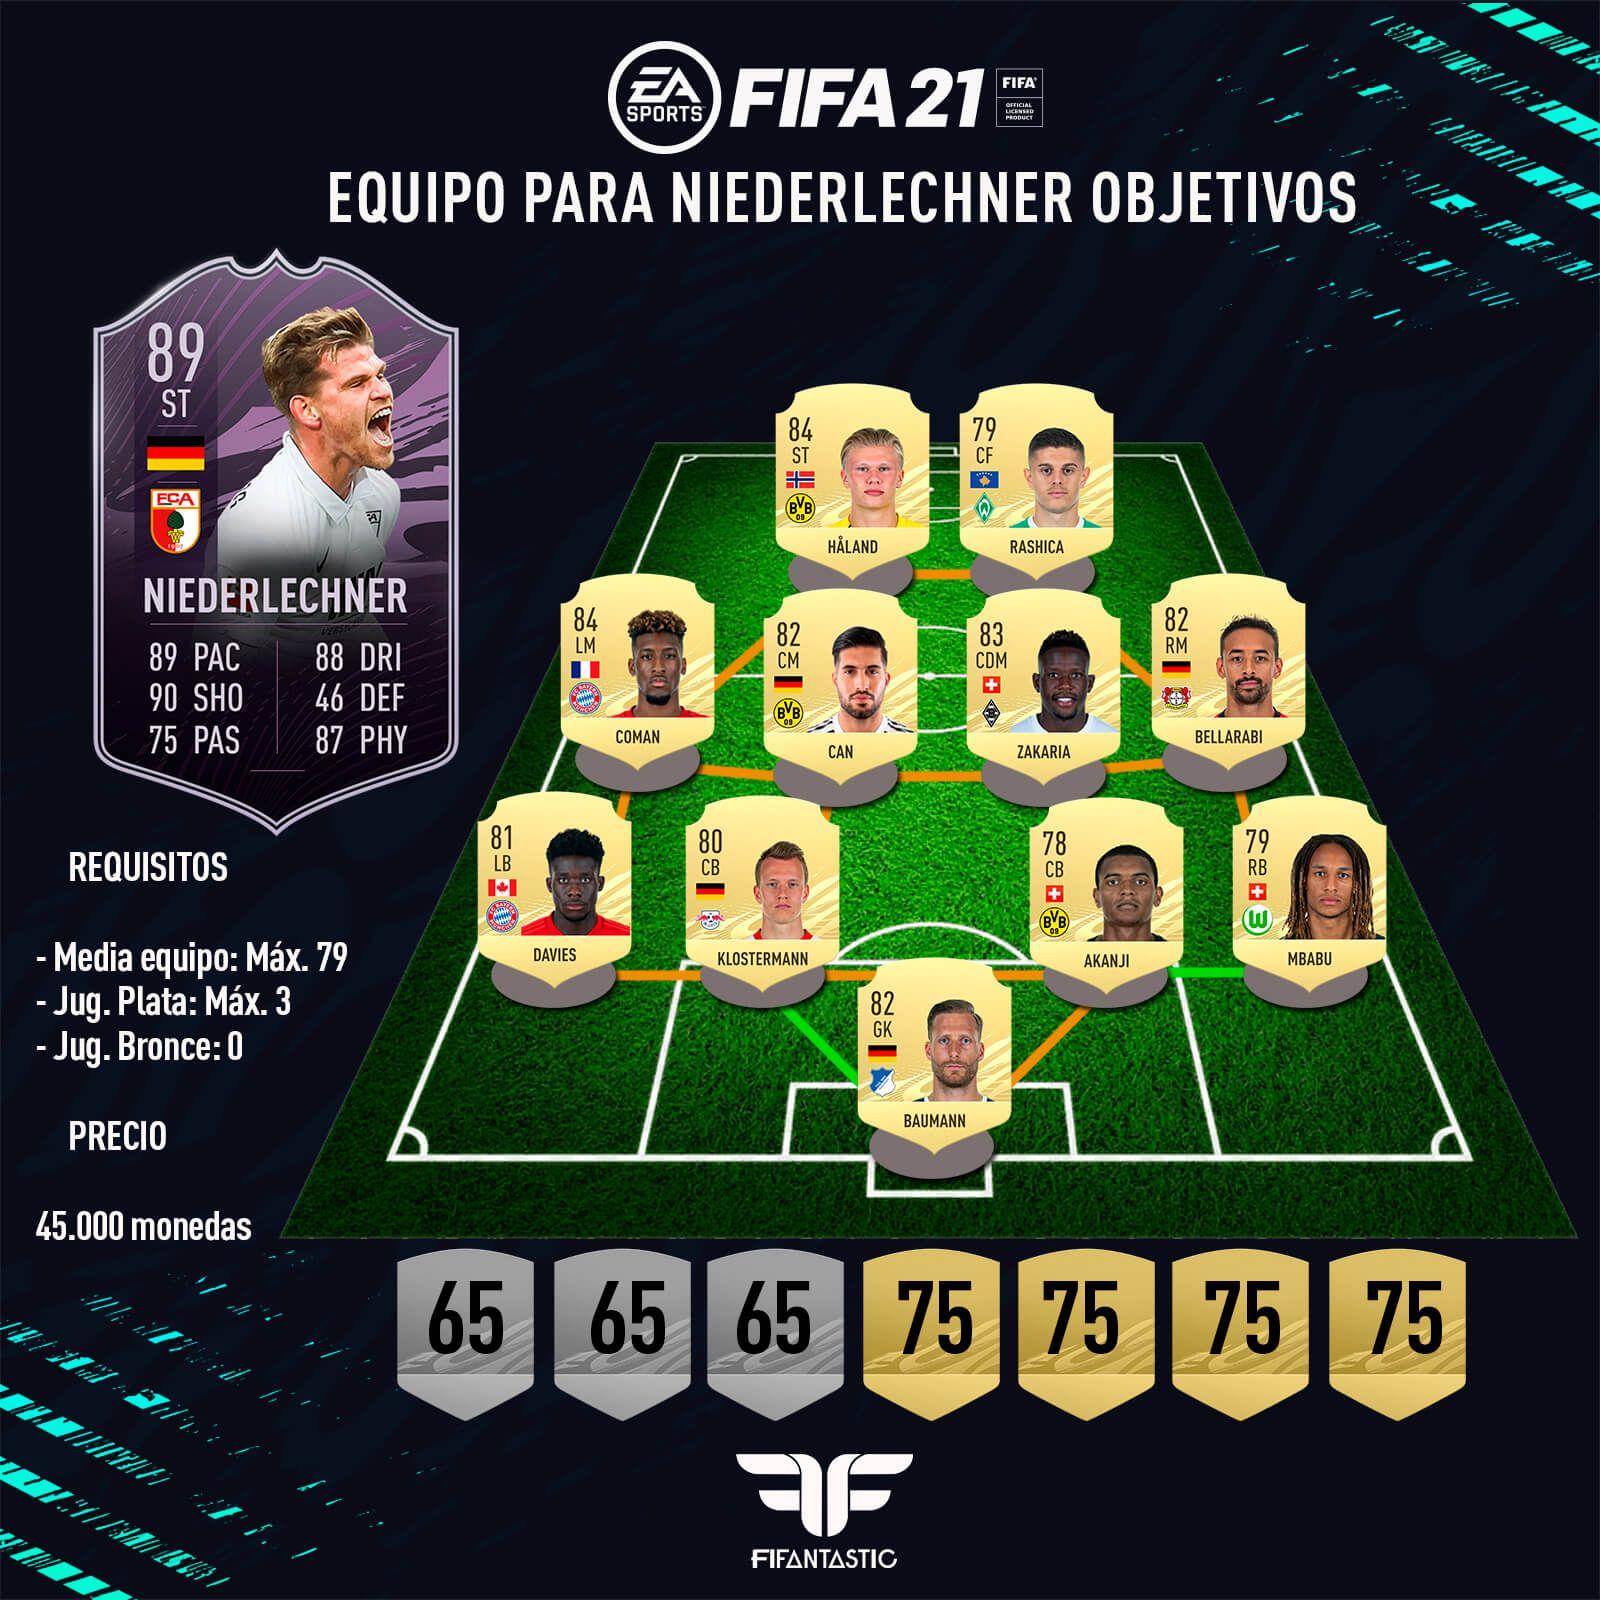 Equipo para conseguir a Niederlechner Objetivos en FIFA 21 Ultimate Team